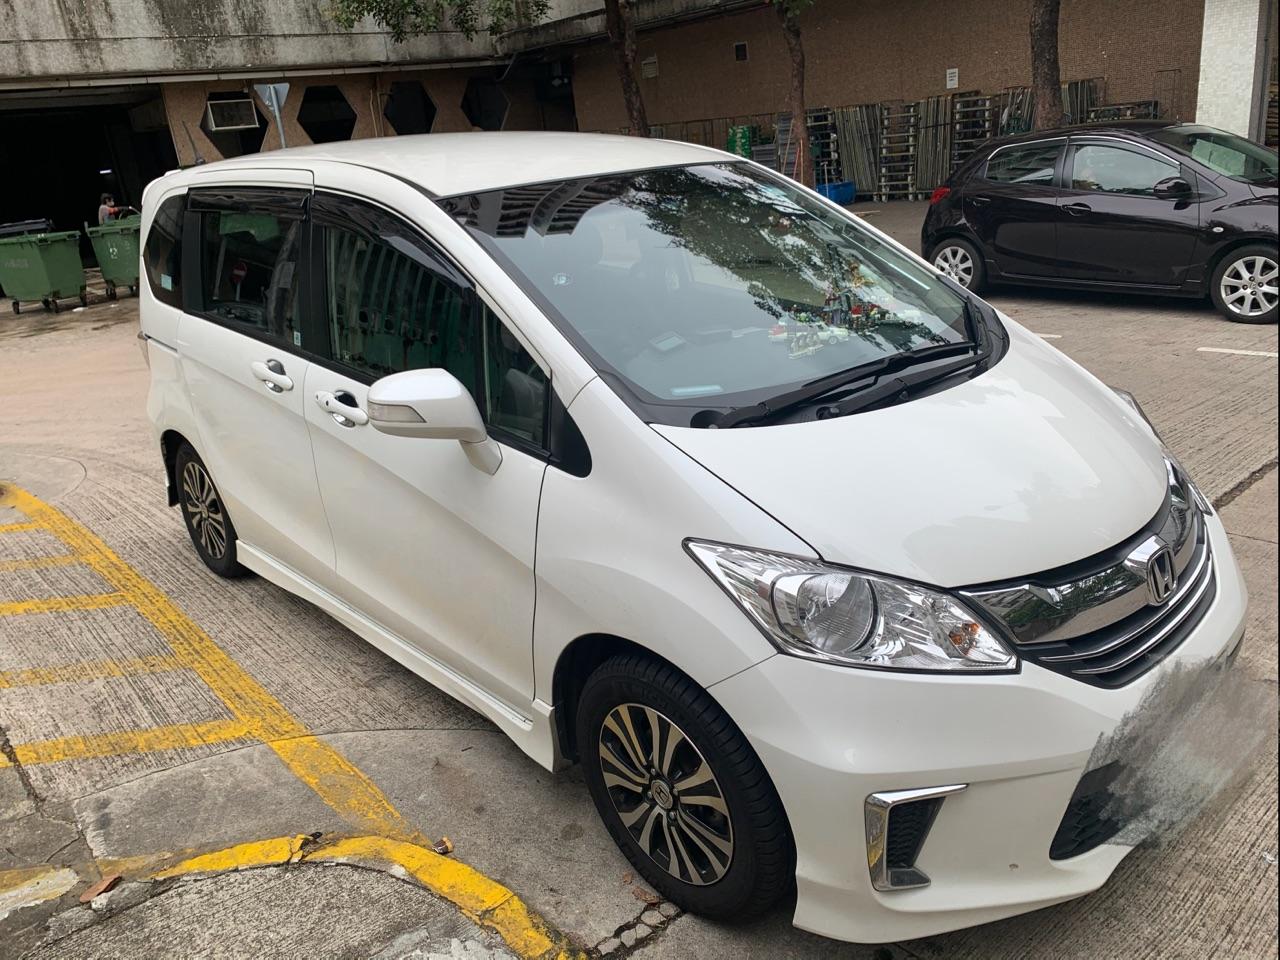 本田 Honda Freed 2015 - Price.com.hk 汽車買賣平台